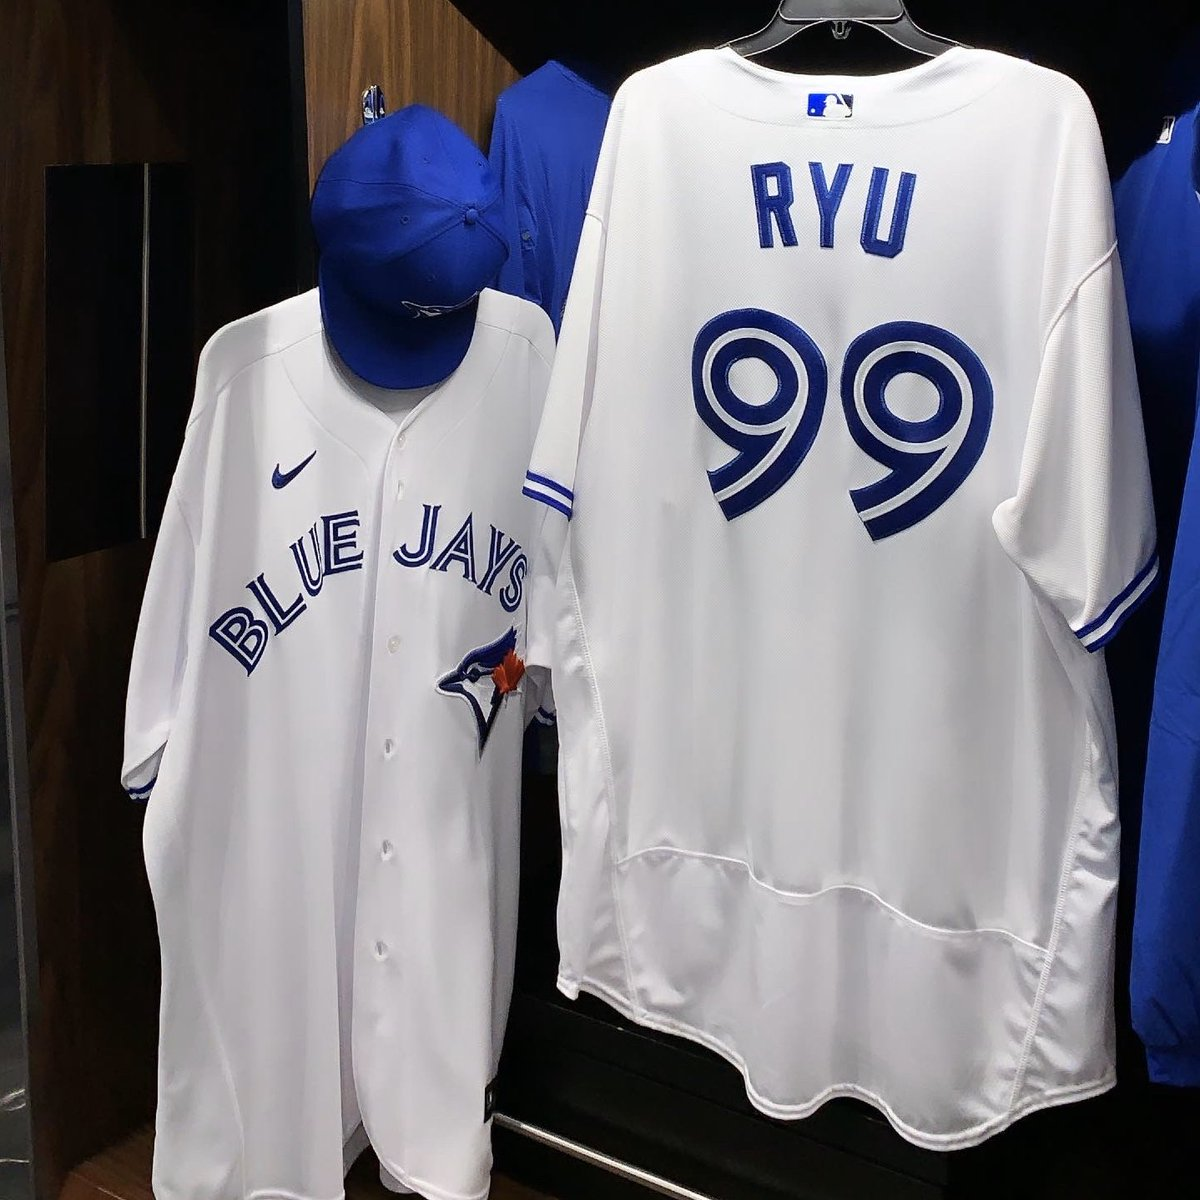 LIVE: Blue Jays introduce Ryu in Toronto